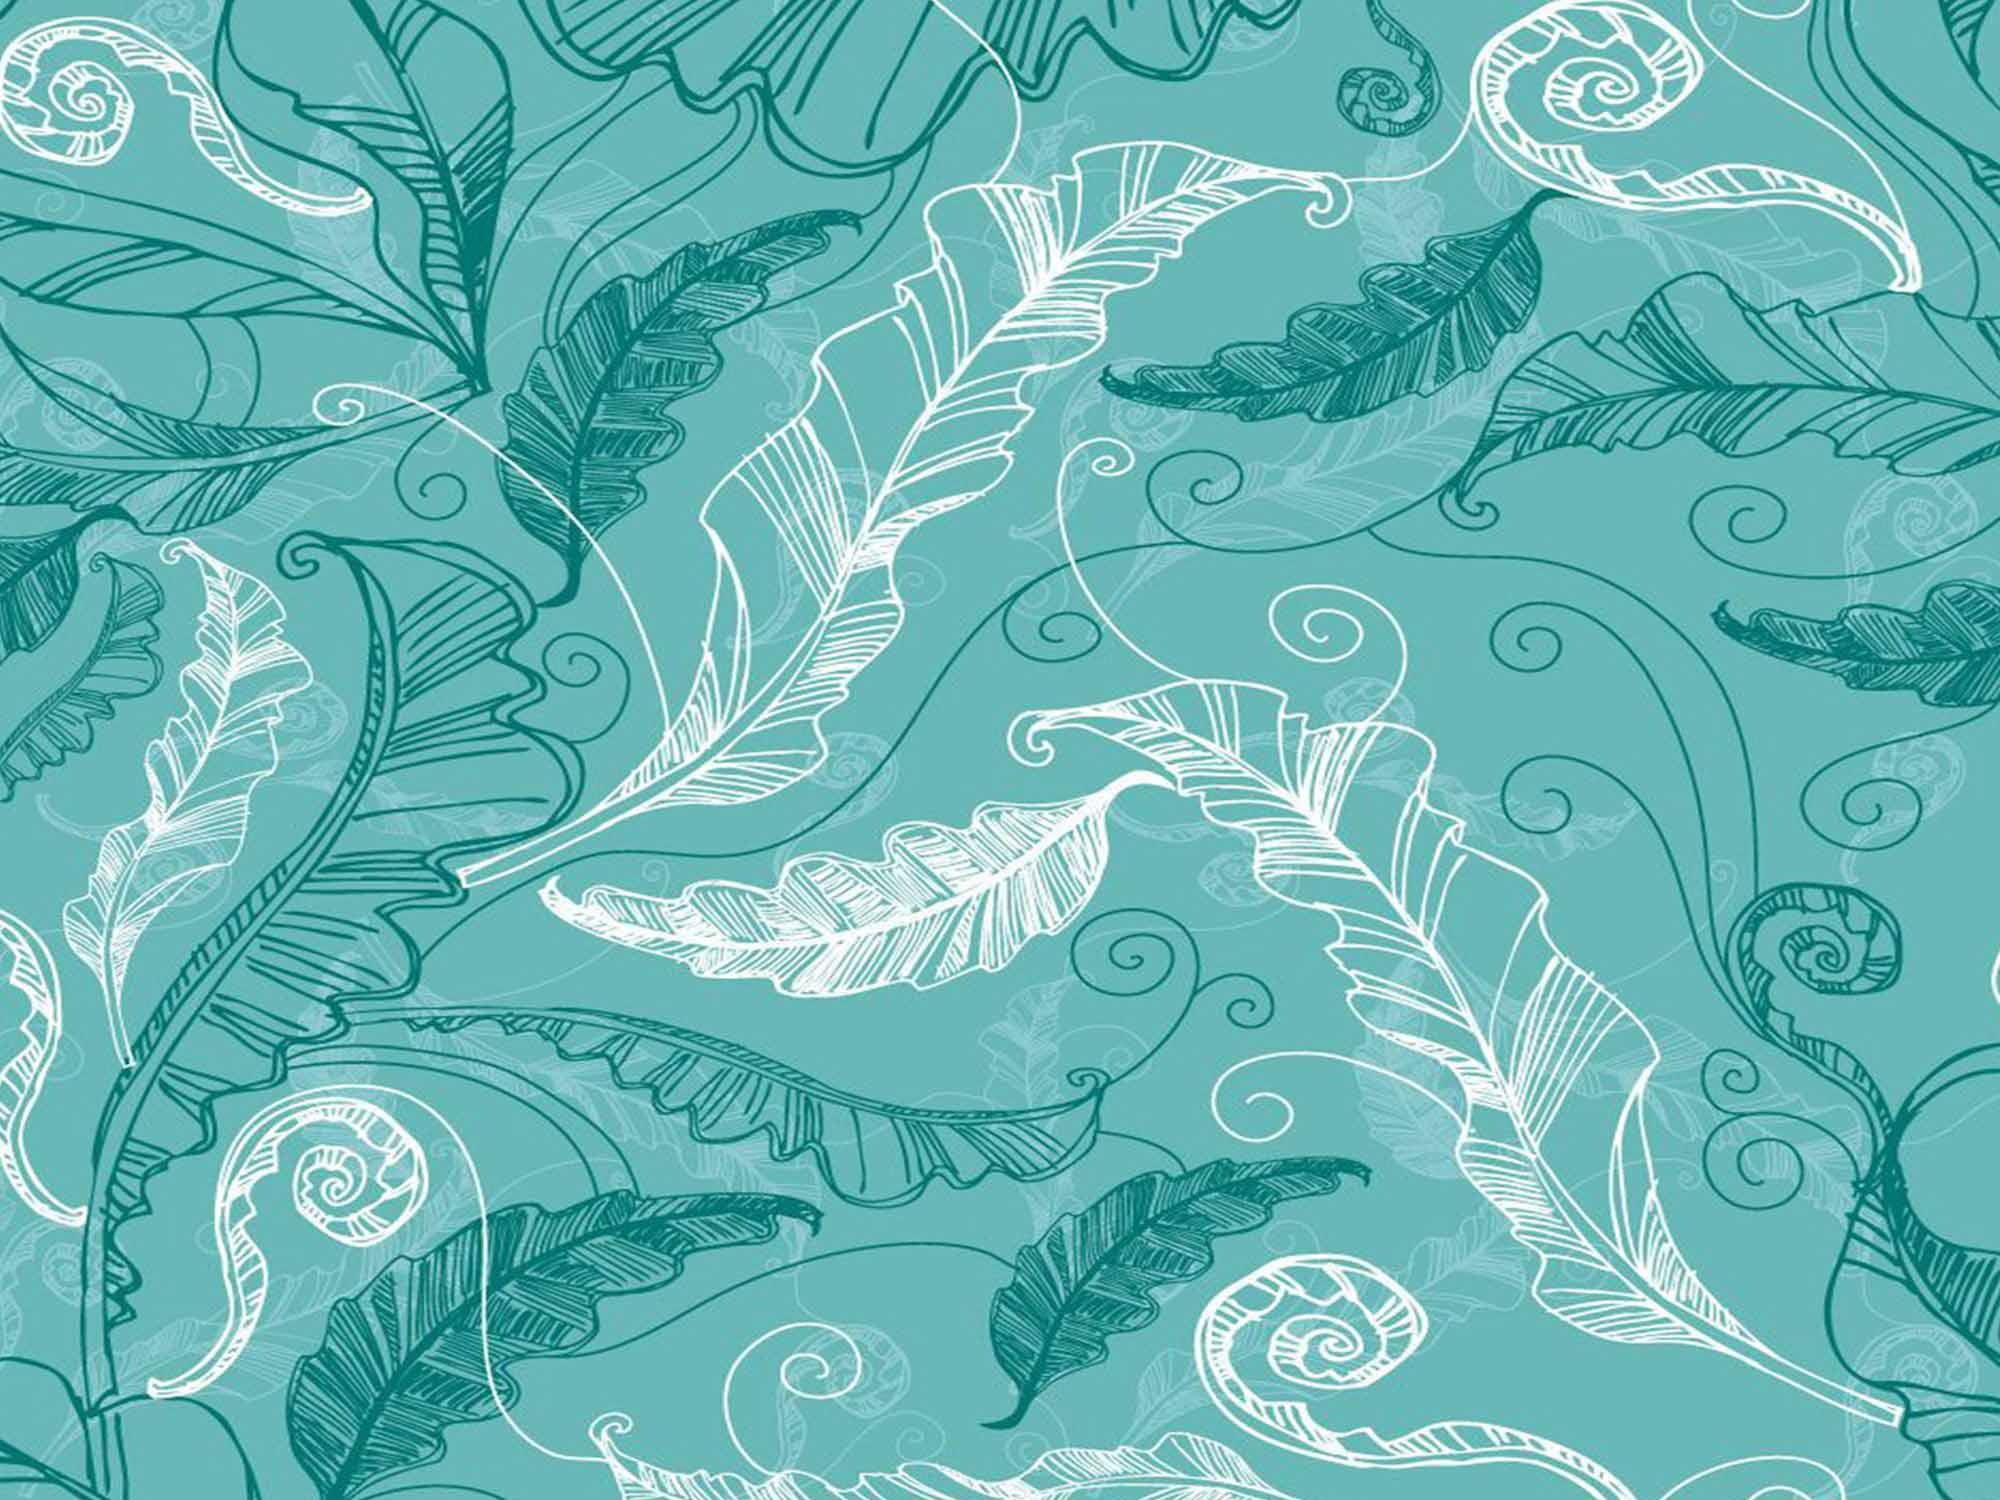 Papel de Parede Floral 0073 - Adesivos de Parede  - Paredes Decoradas